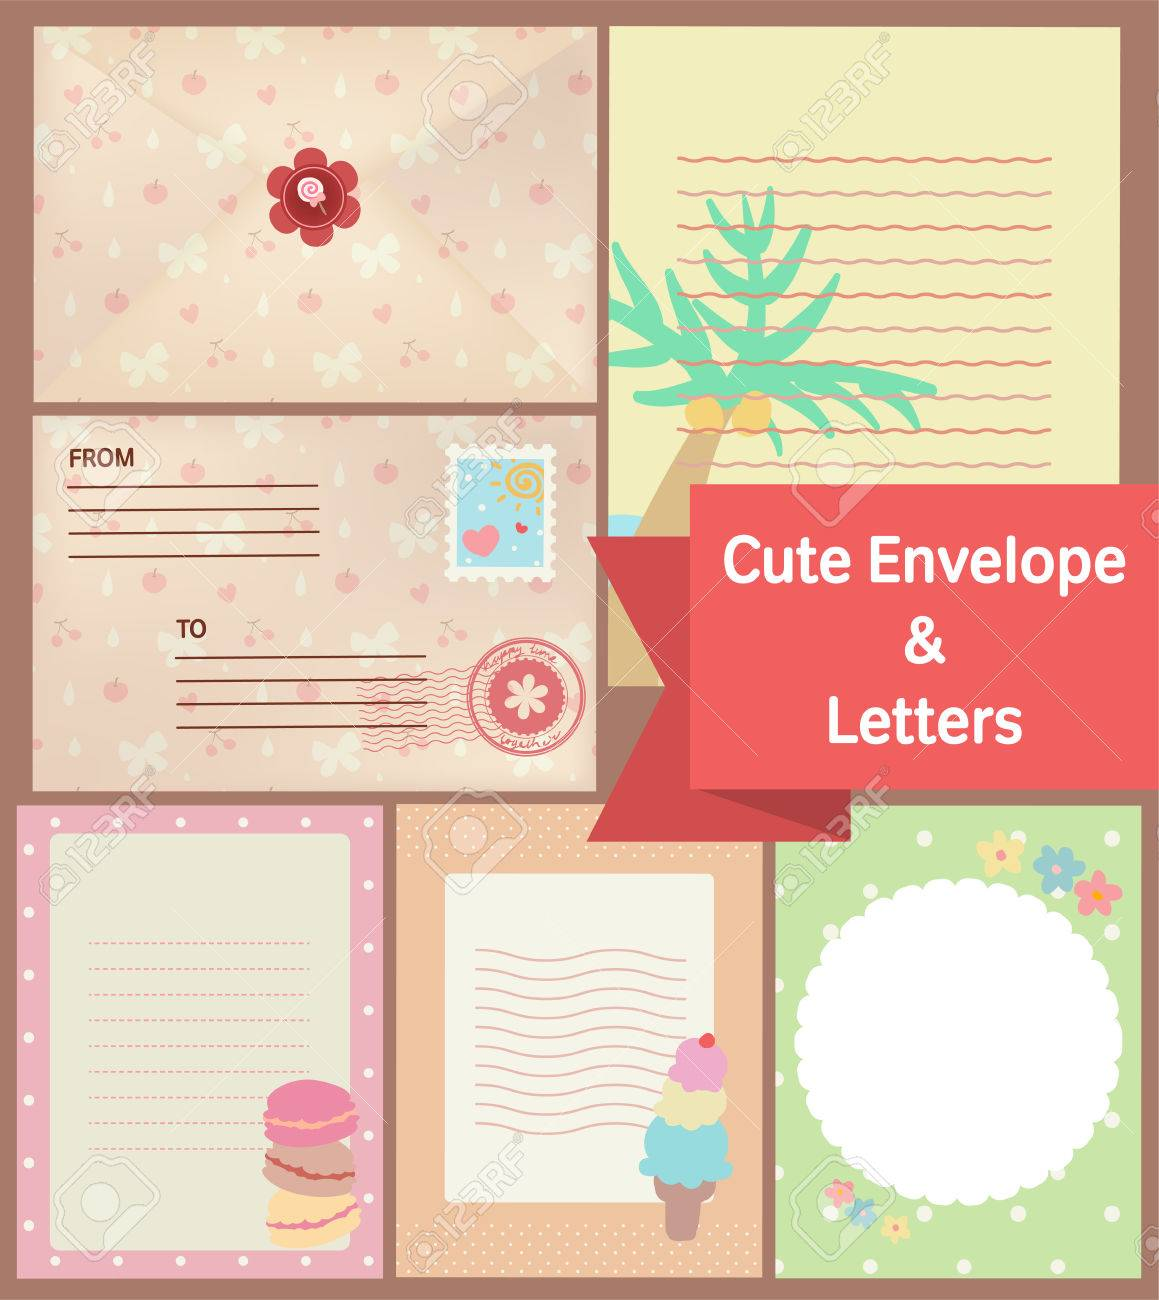 Cute vintage pastel letters and envelope paper template stock photo cute vintage pastel letters and envelope paper template stock photo 43137354 maxwellsz